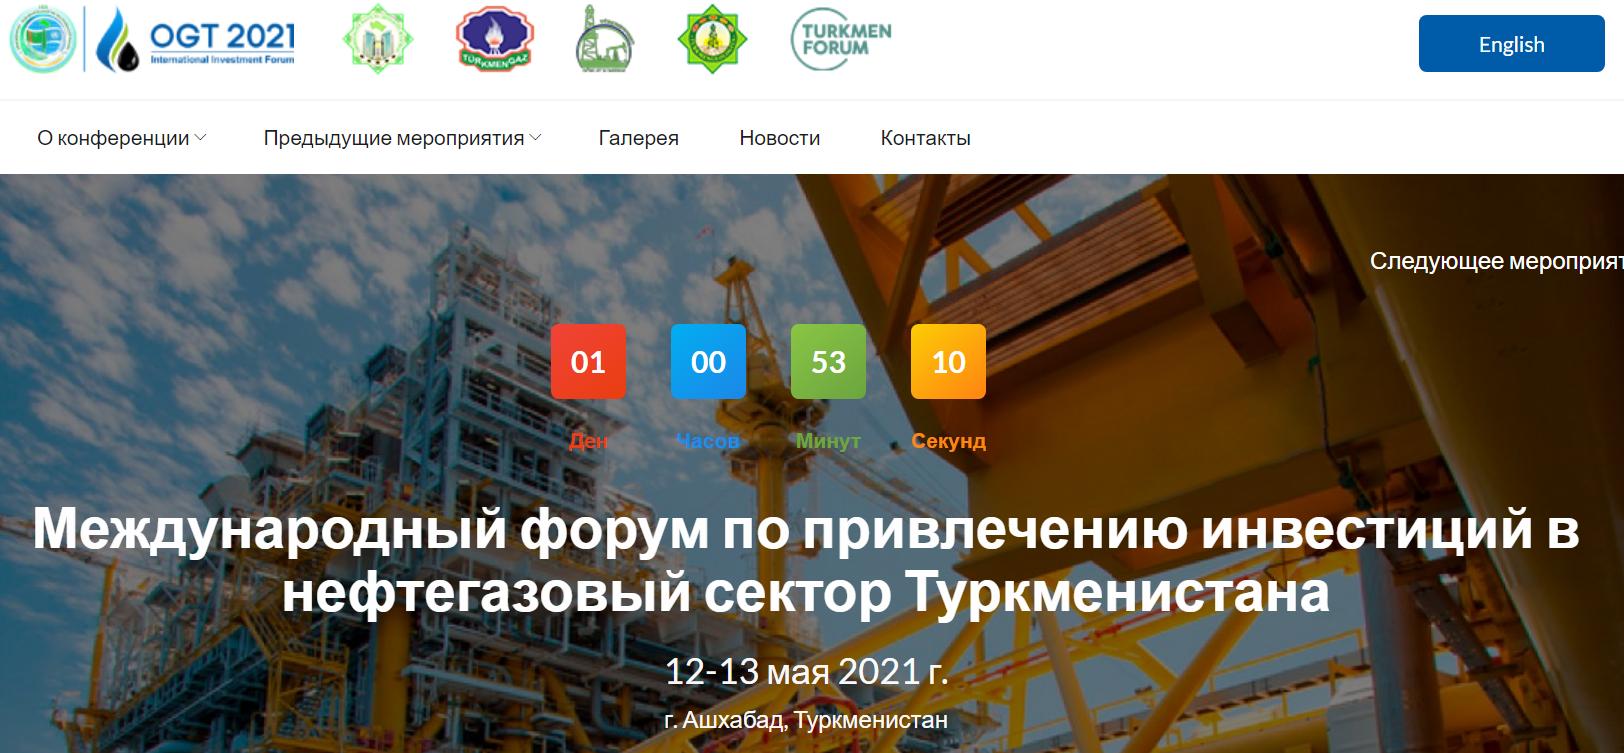 https://www.oilgas.gov.tm/storage/posts/2173/original-1609a366c70eda.png